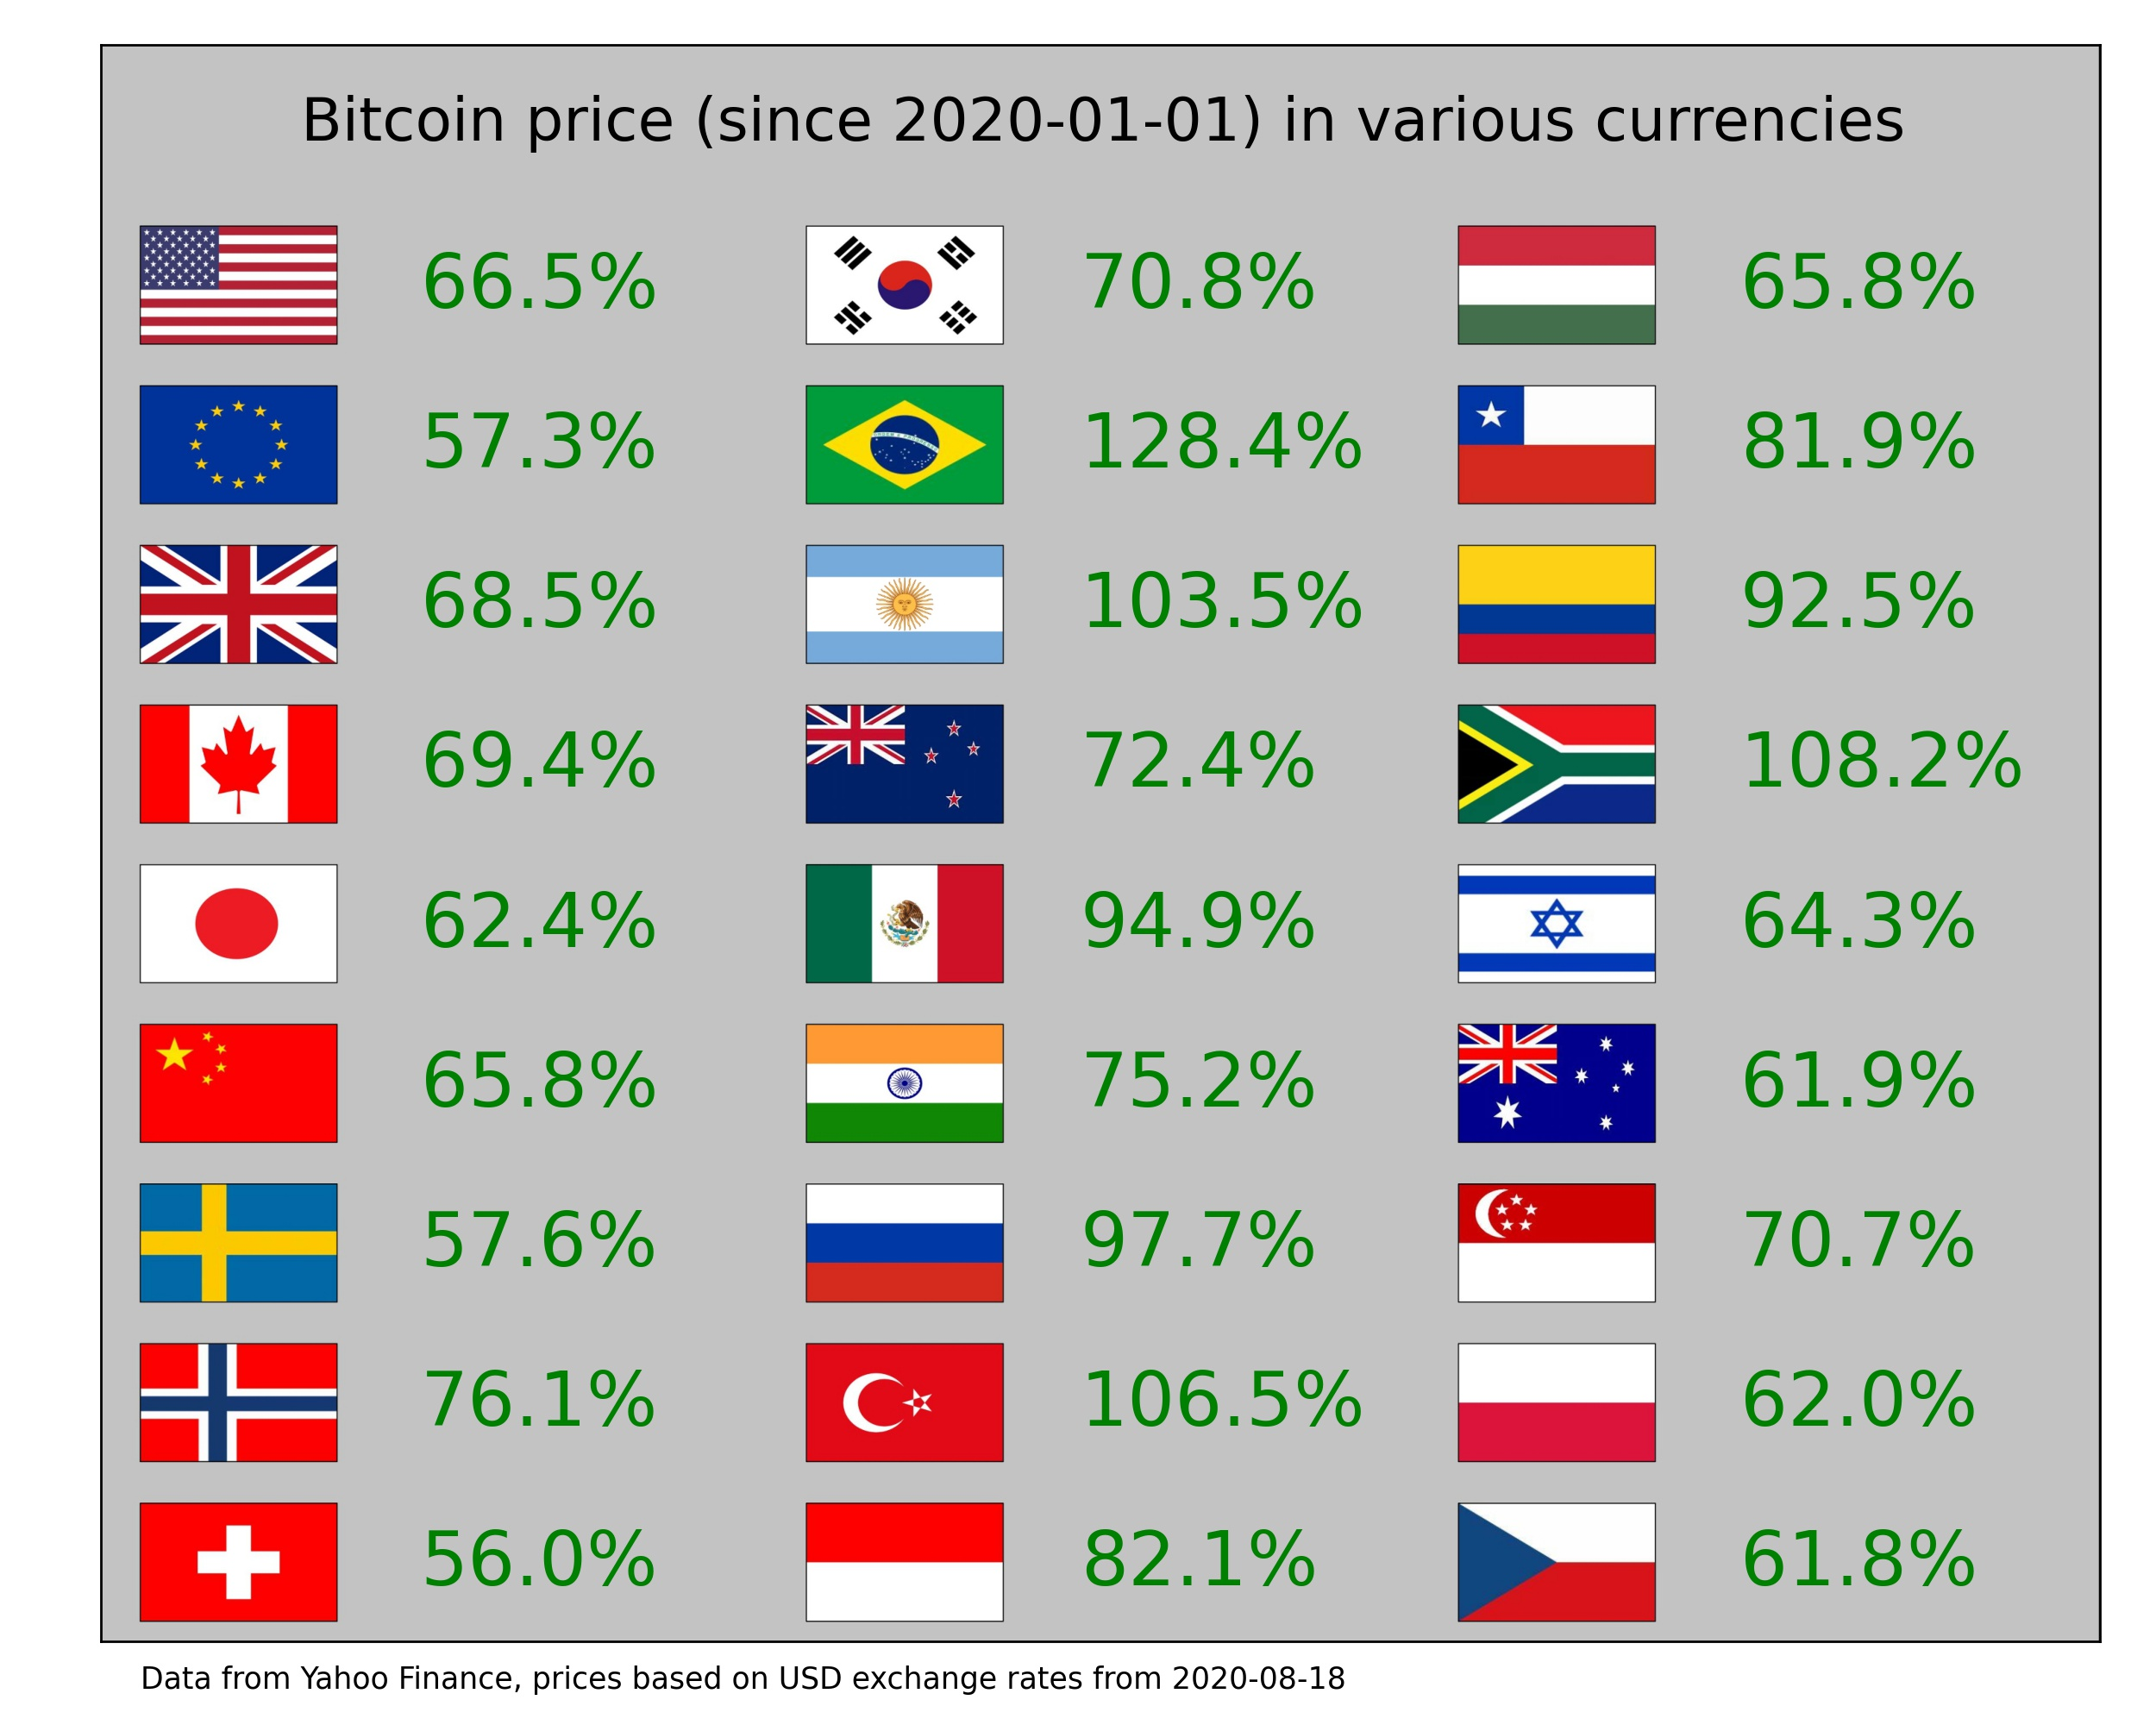 mit tudok fizetni a bitcoinnal)